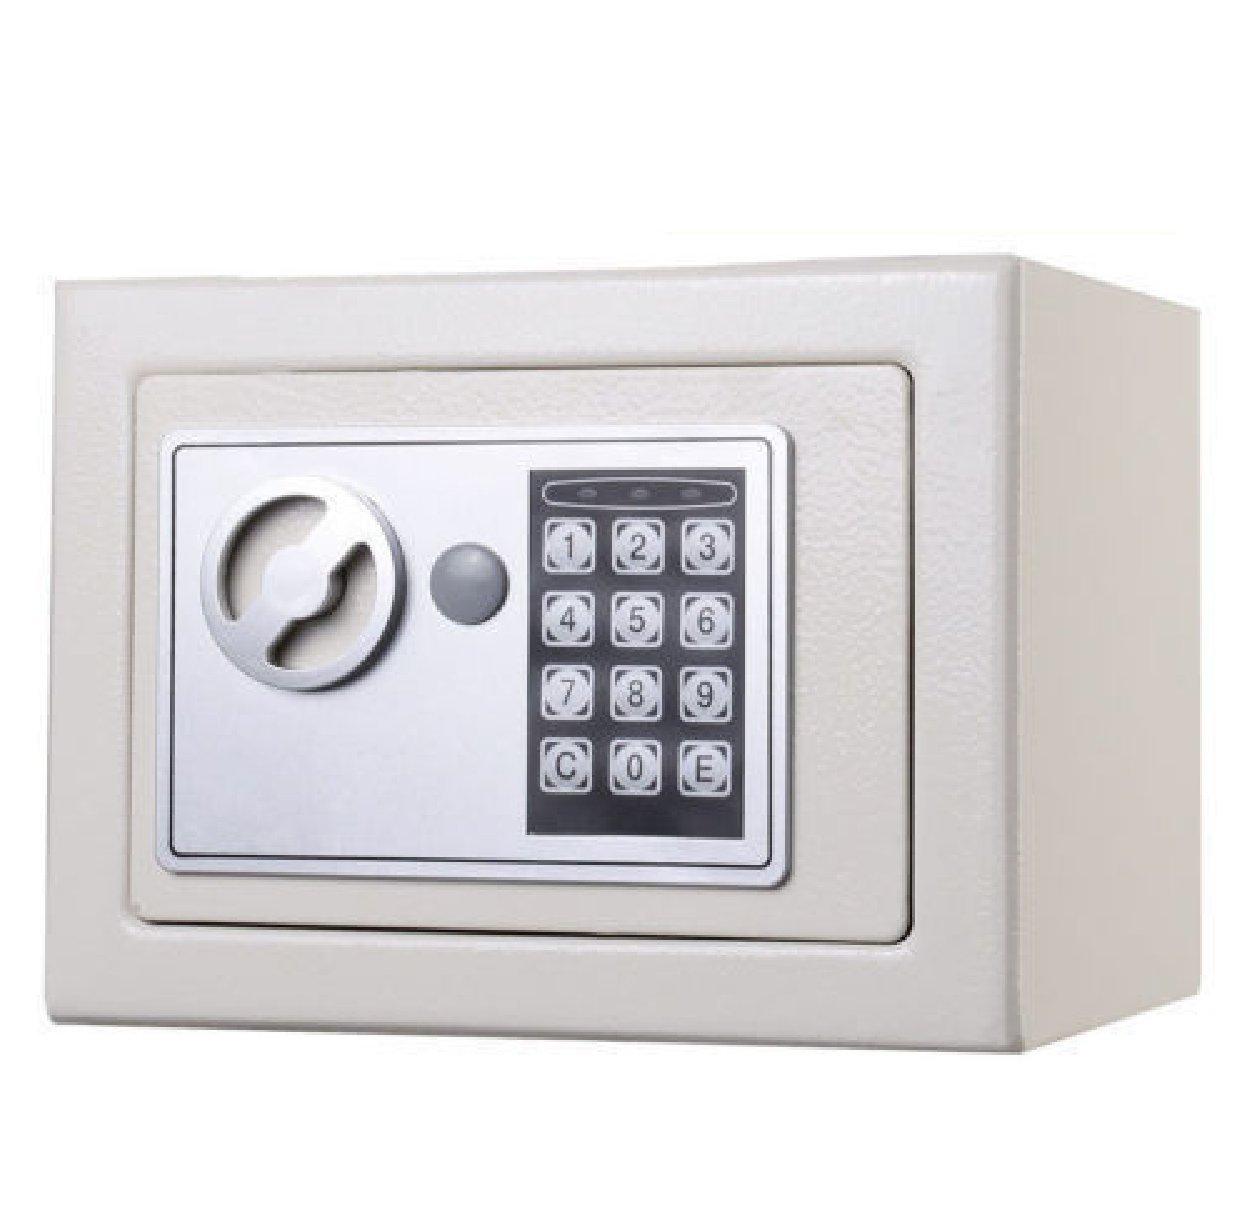 Durable Keypad Lock Home Hotel : NEW Small White Digital Electronic Safe Box Keypad Lock Home Office Hotel Gun : Safe Box Small White Electronic